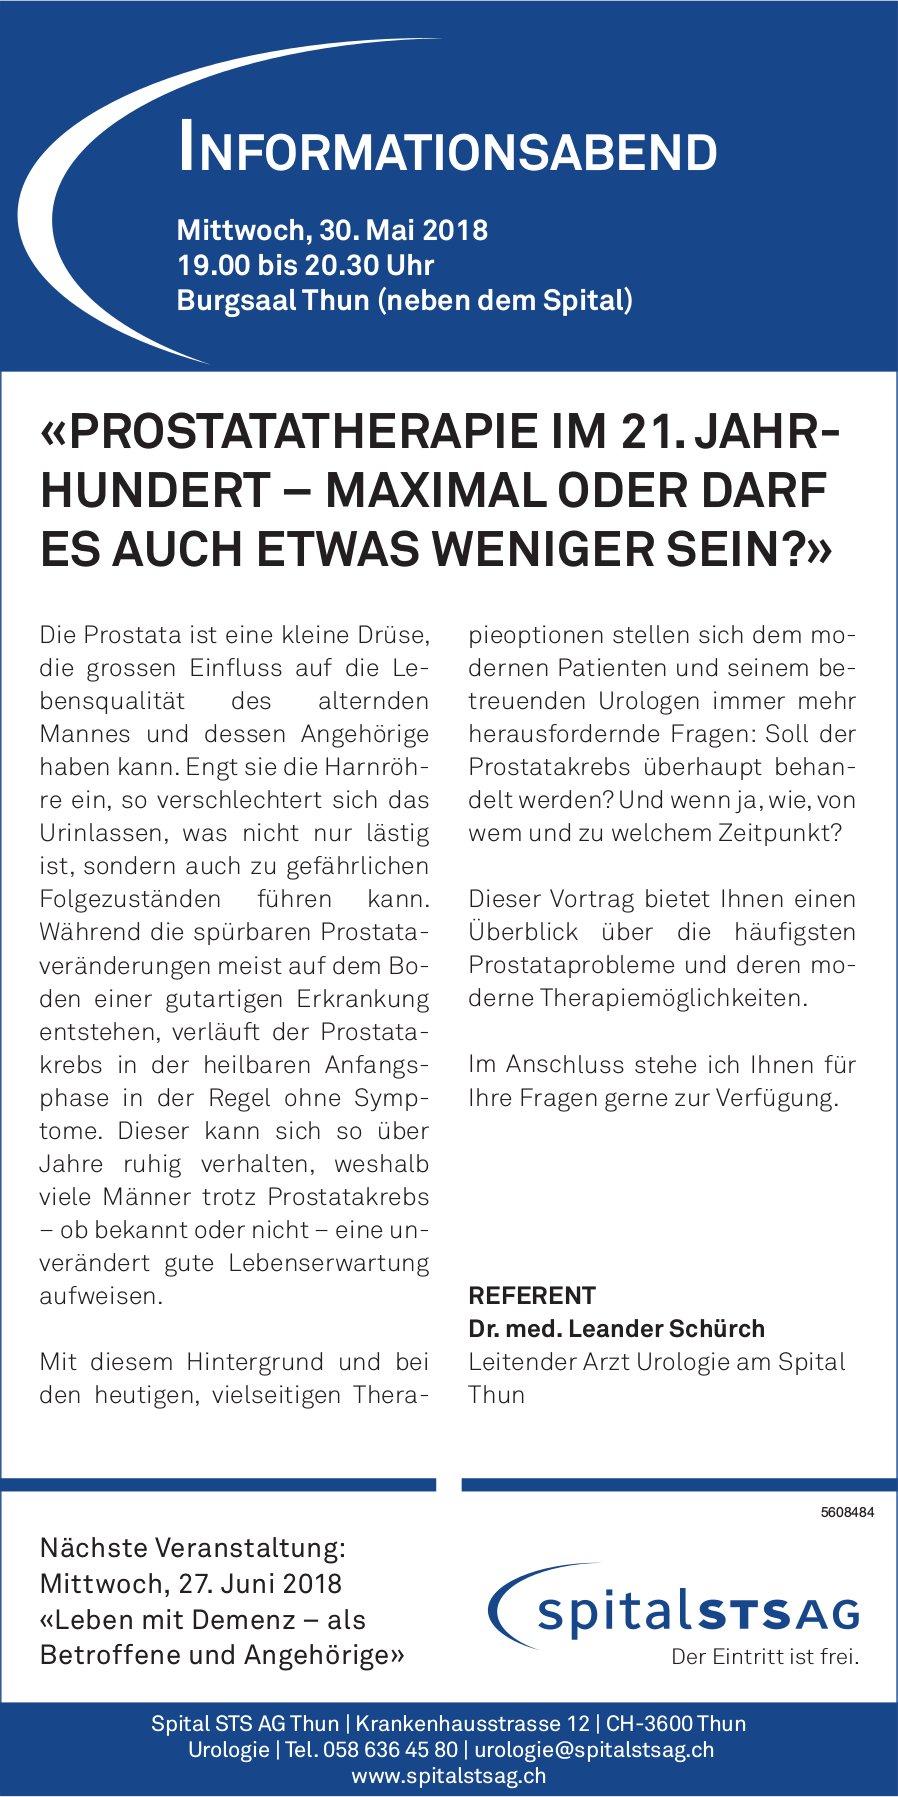 "Spital STS AG Thun - Informationsabend «Prostatatherapie im 21. Jahrundert..."" am 30. Mai"